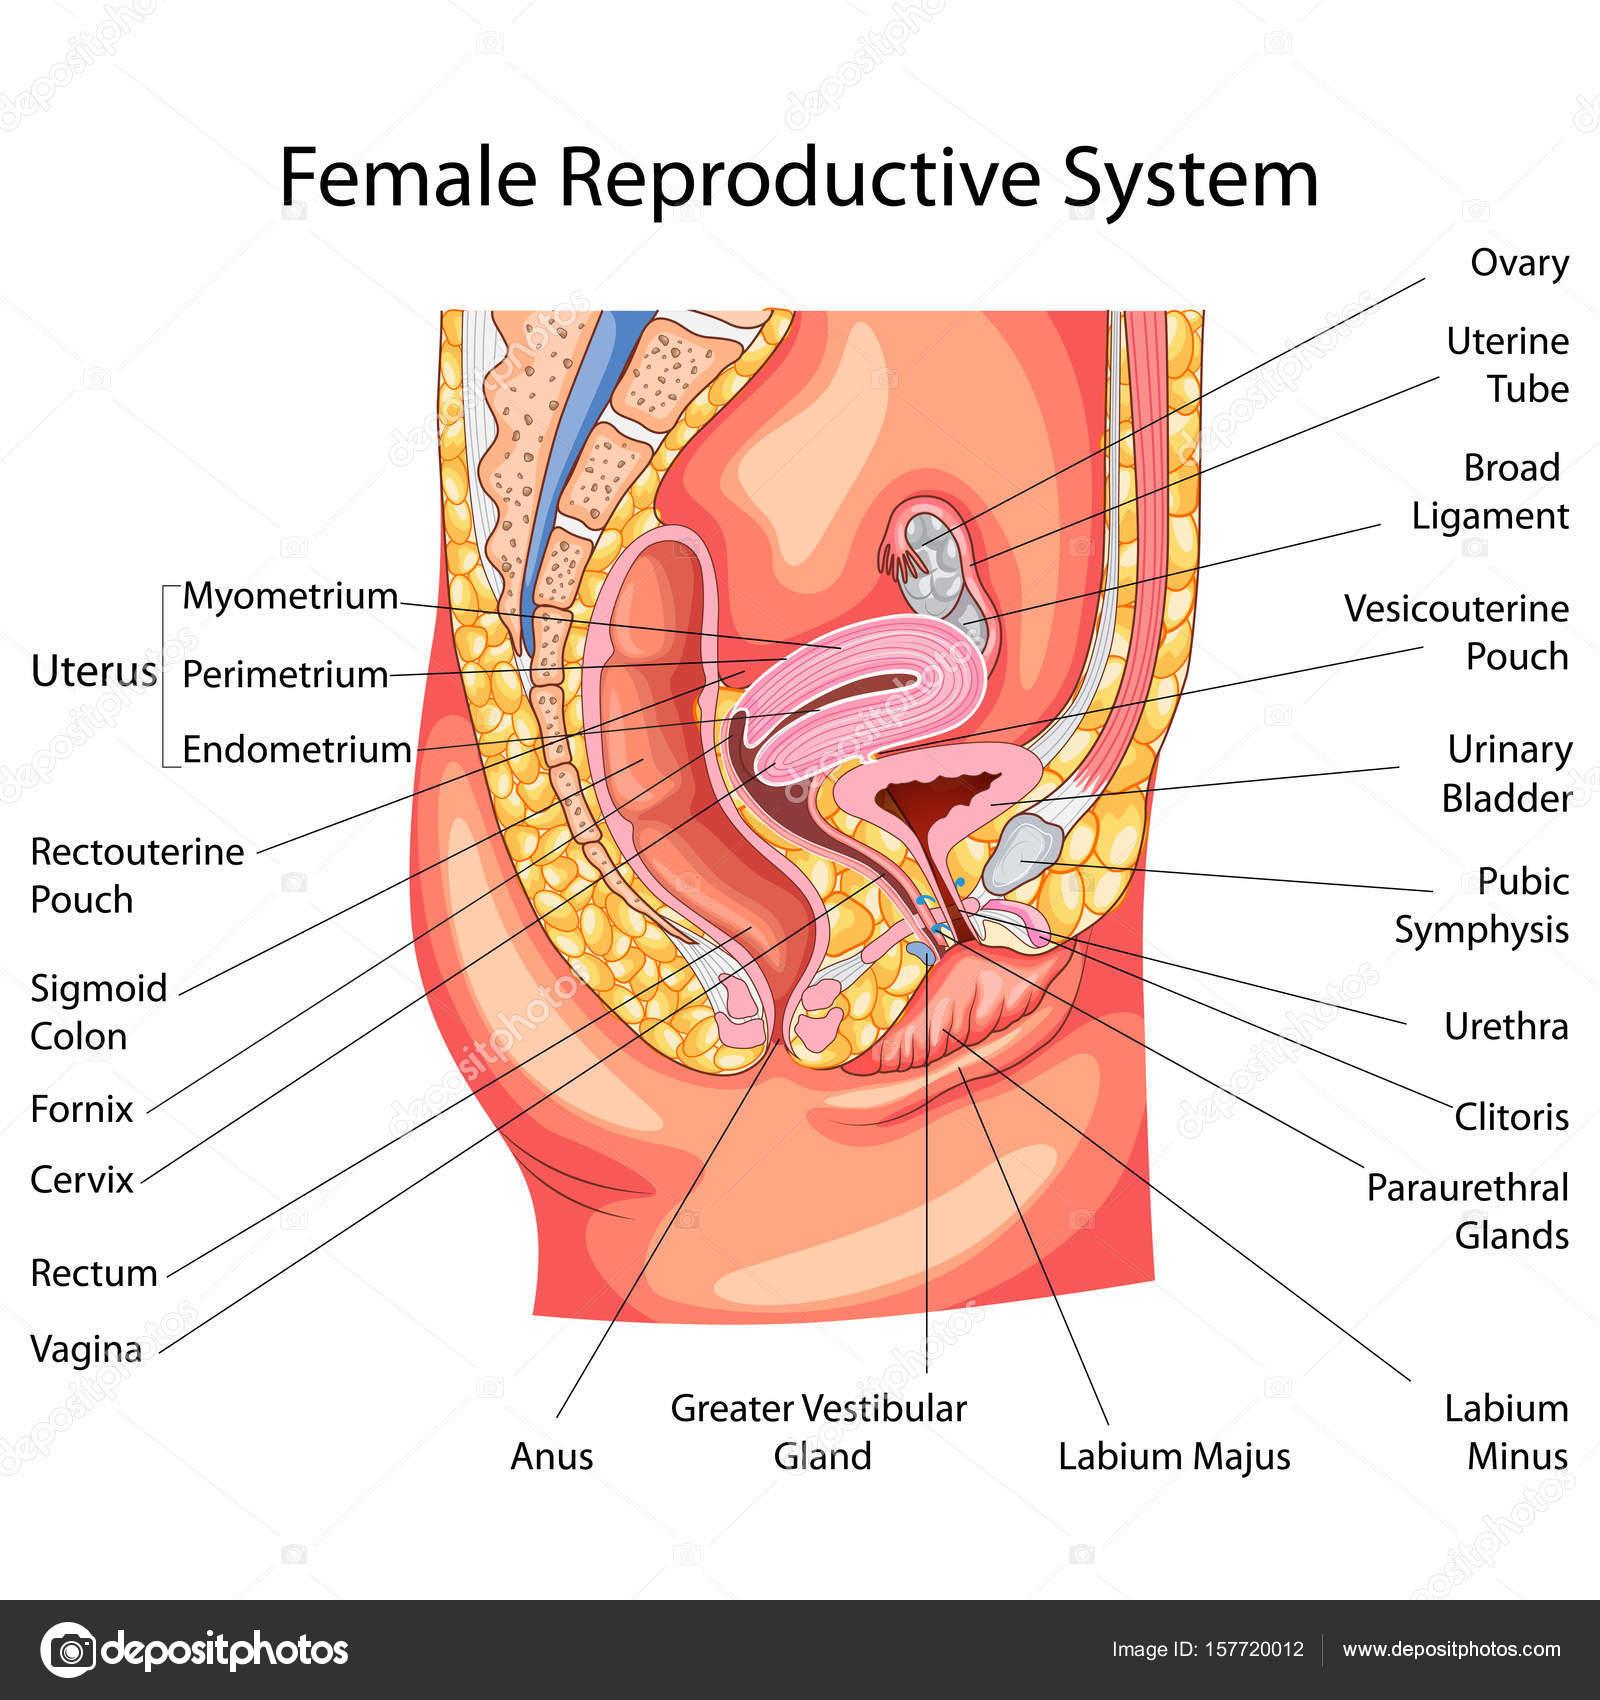 Female reproductive organ diagram